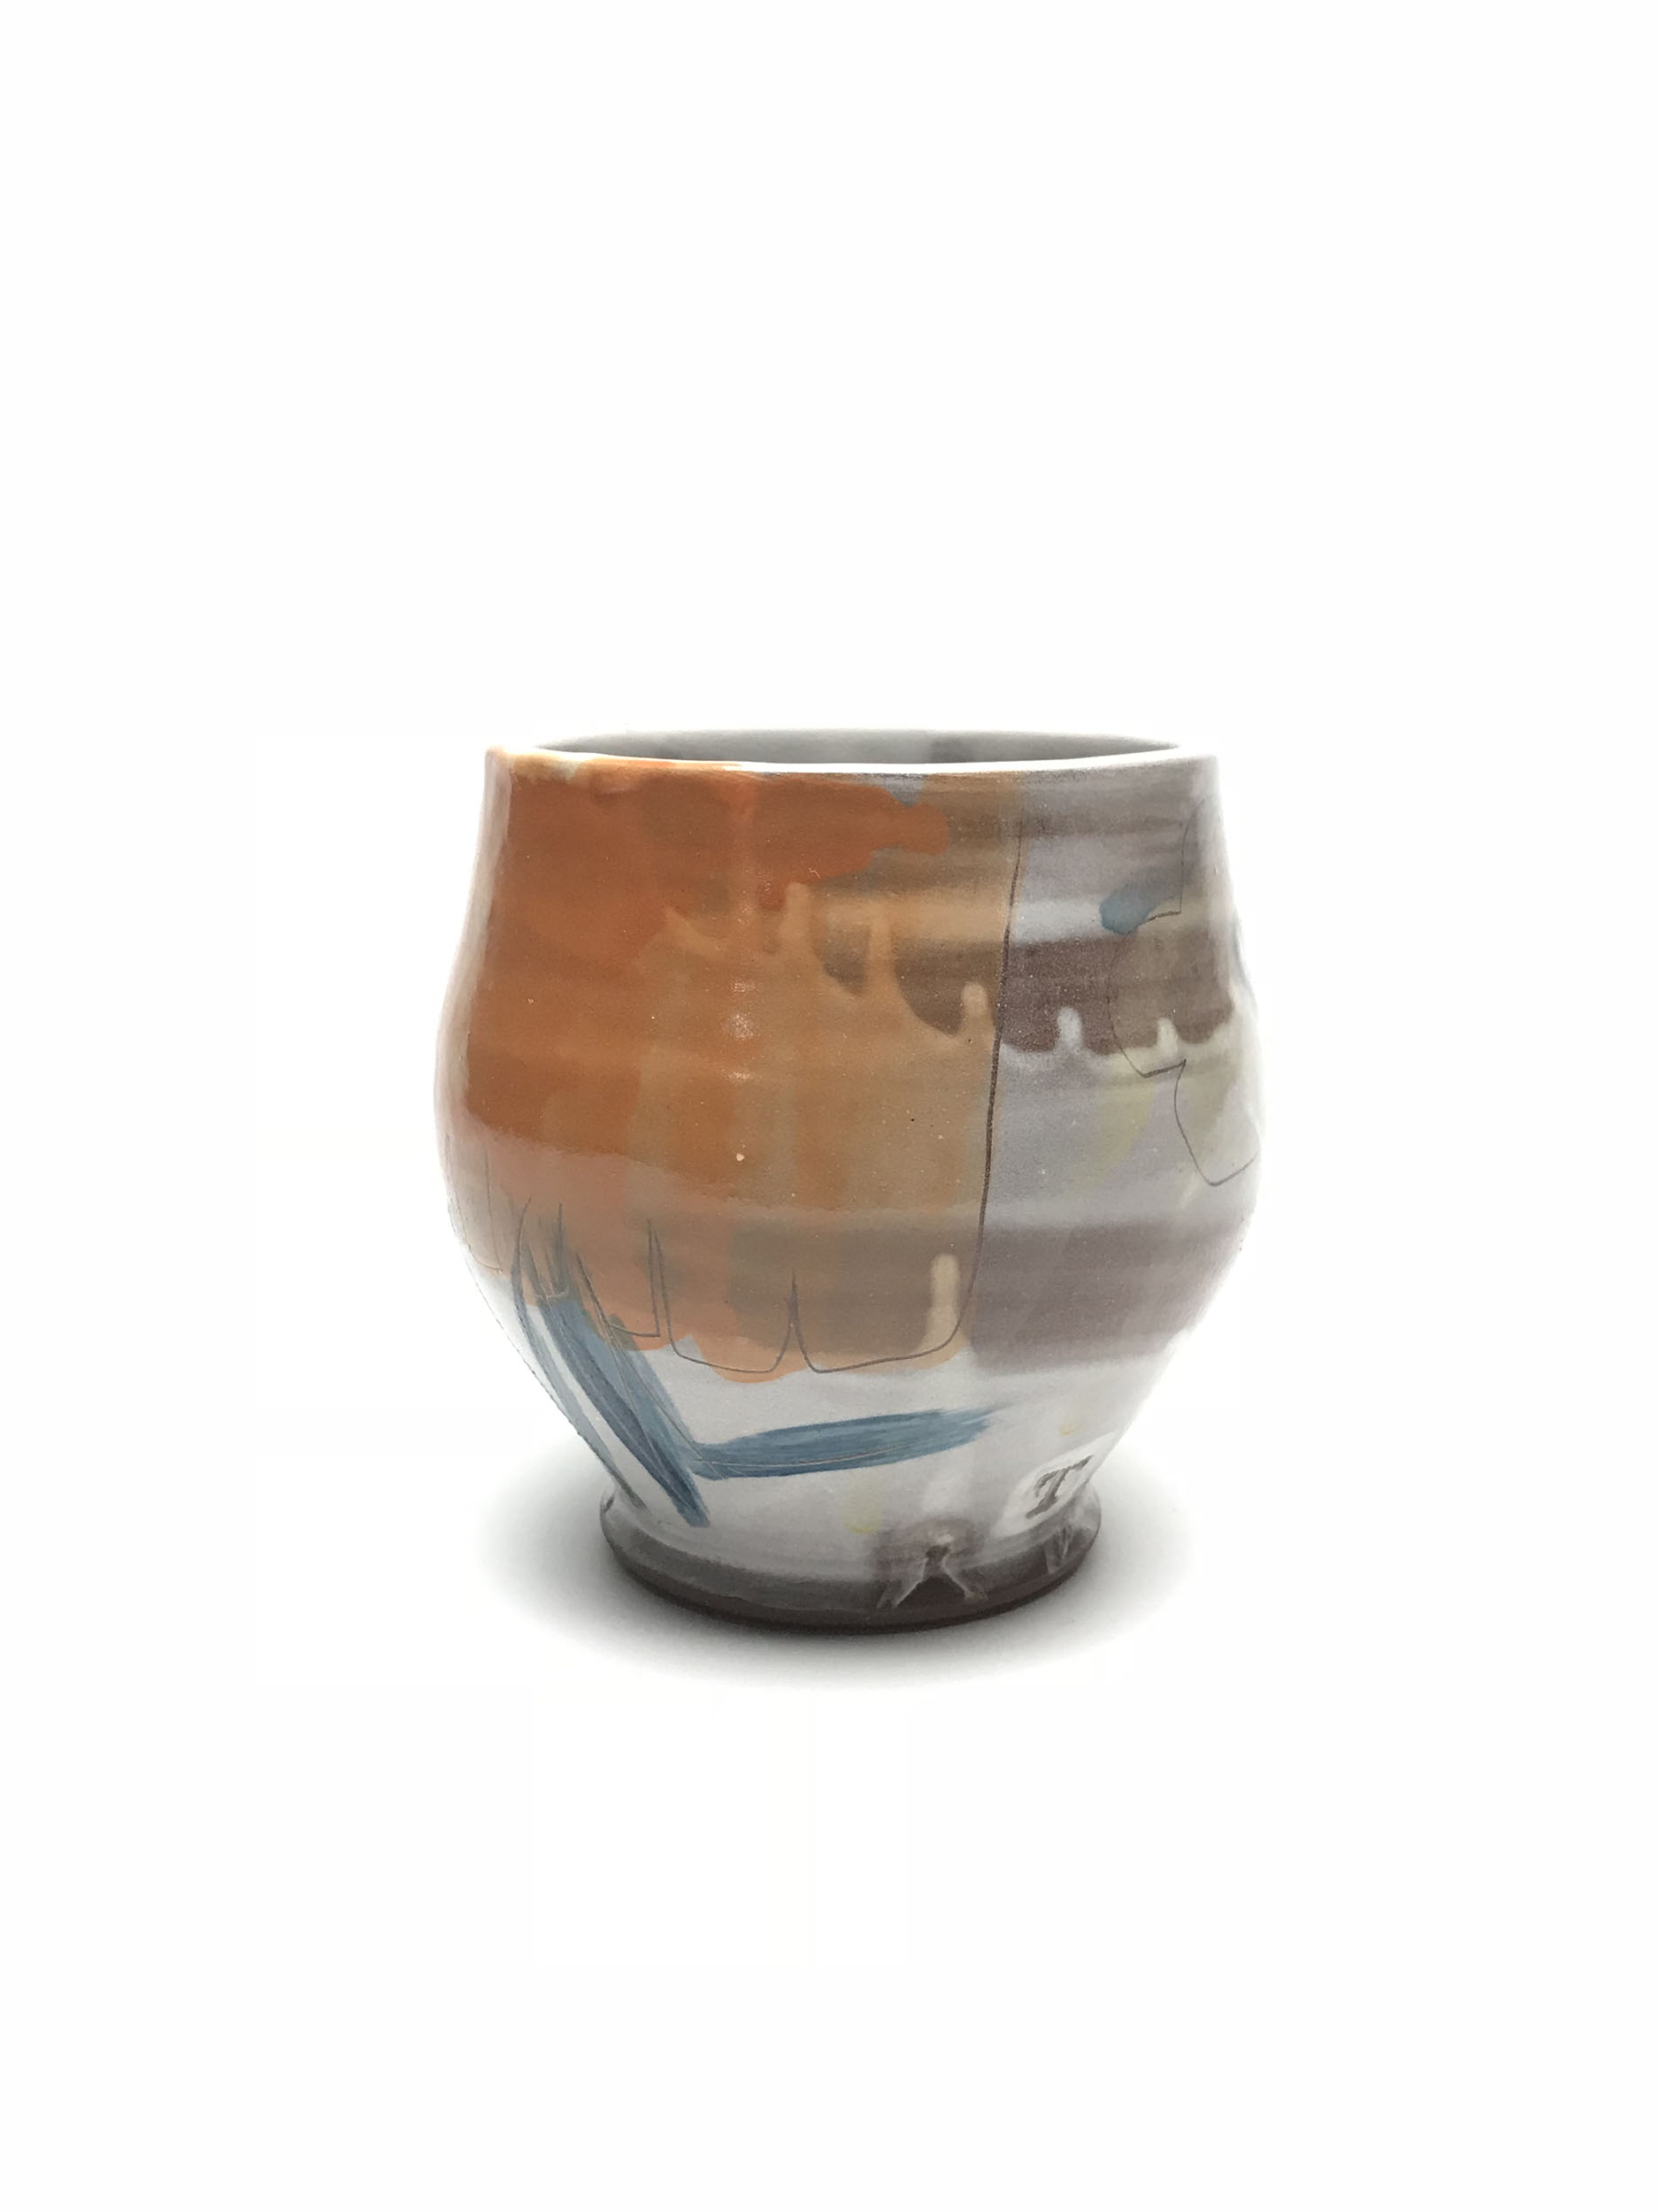 Teabowl  Earthen Red Clay, Slips, Underglaze Glaze